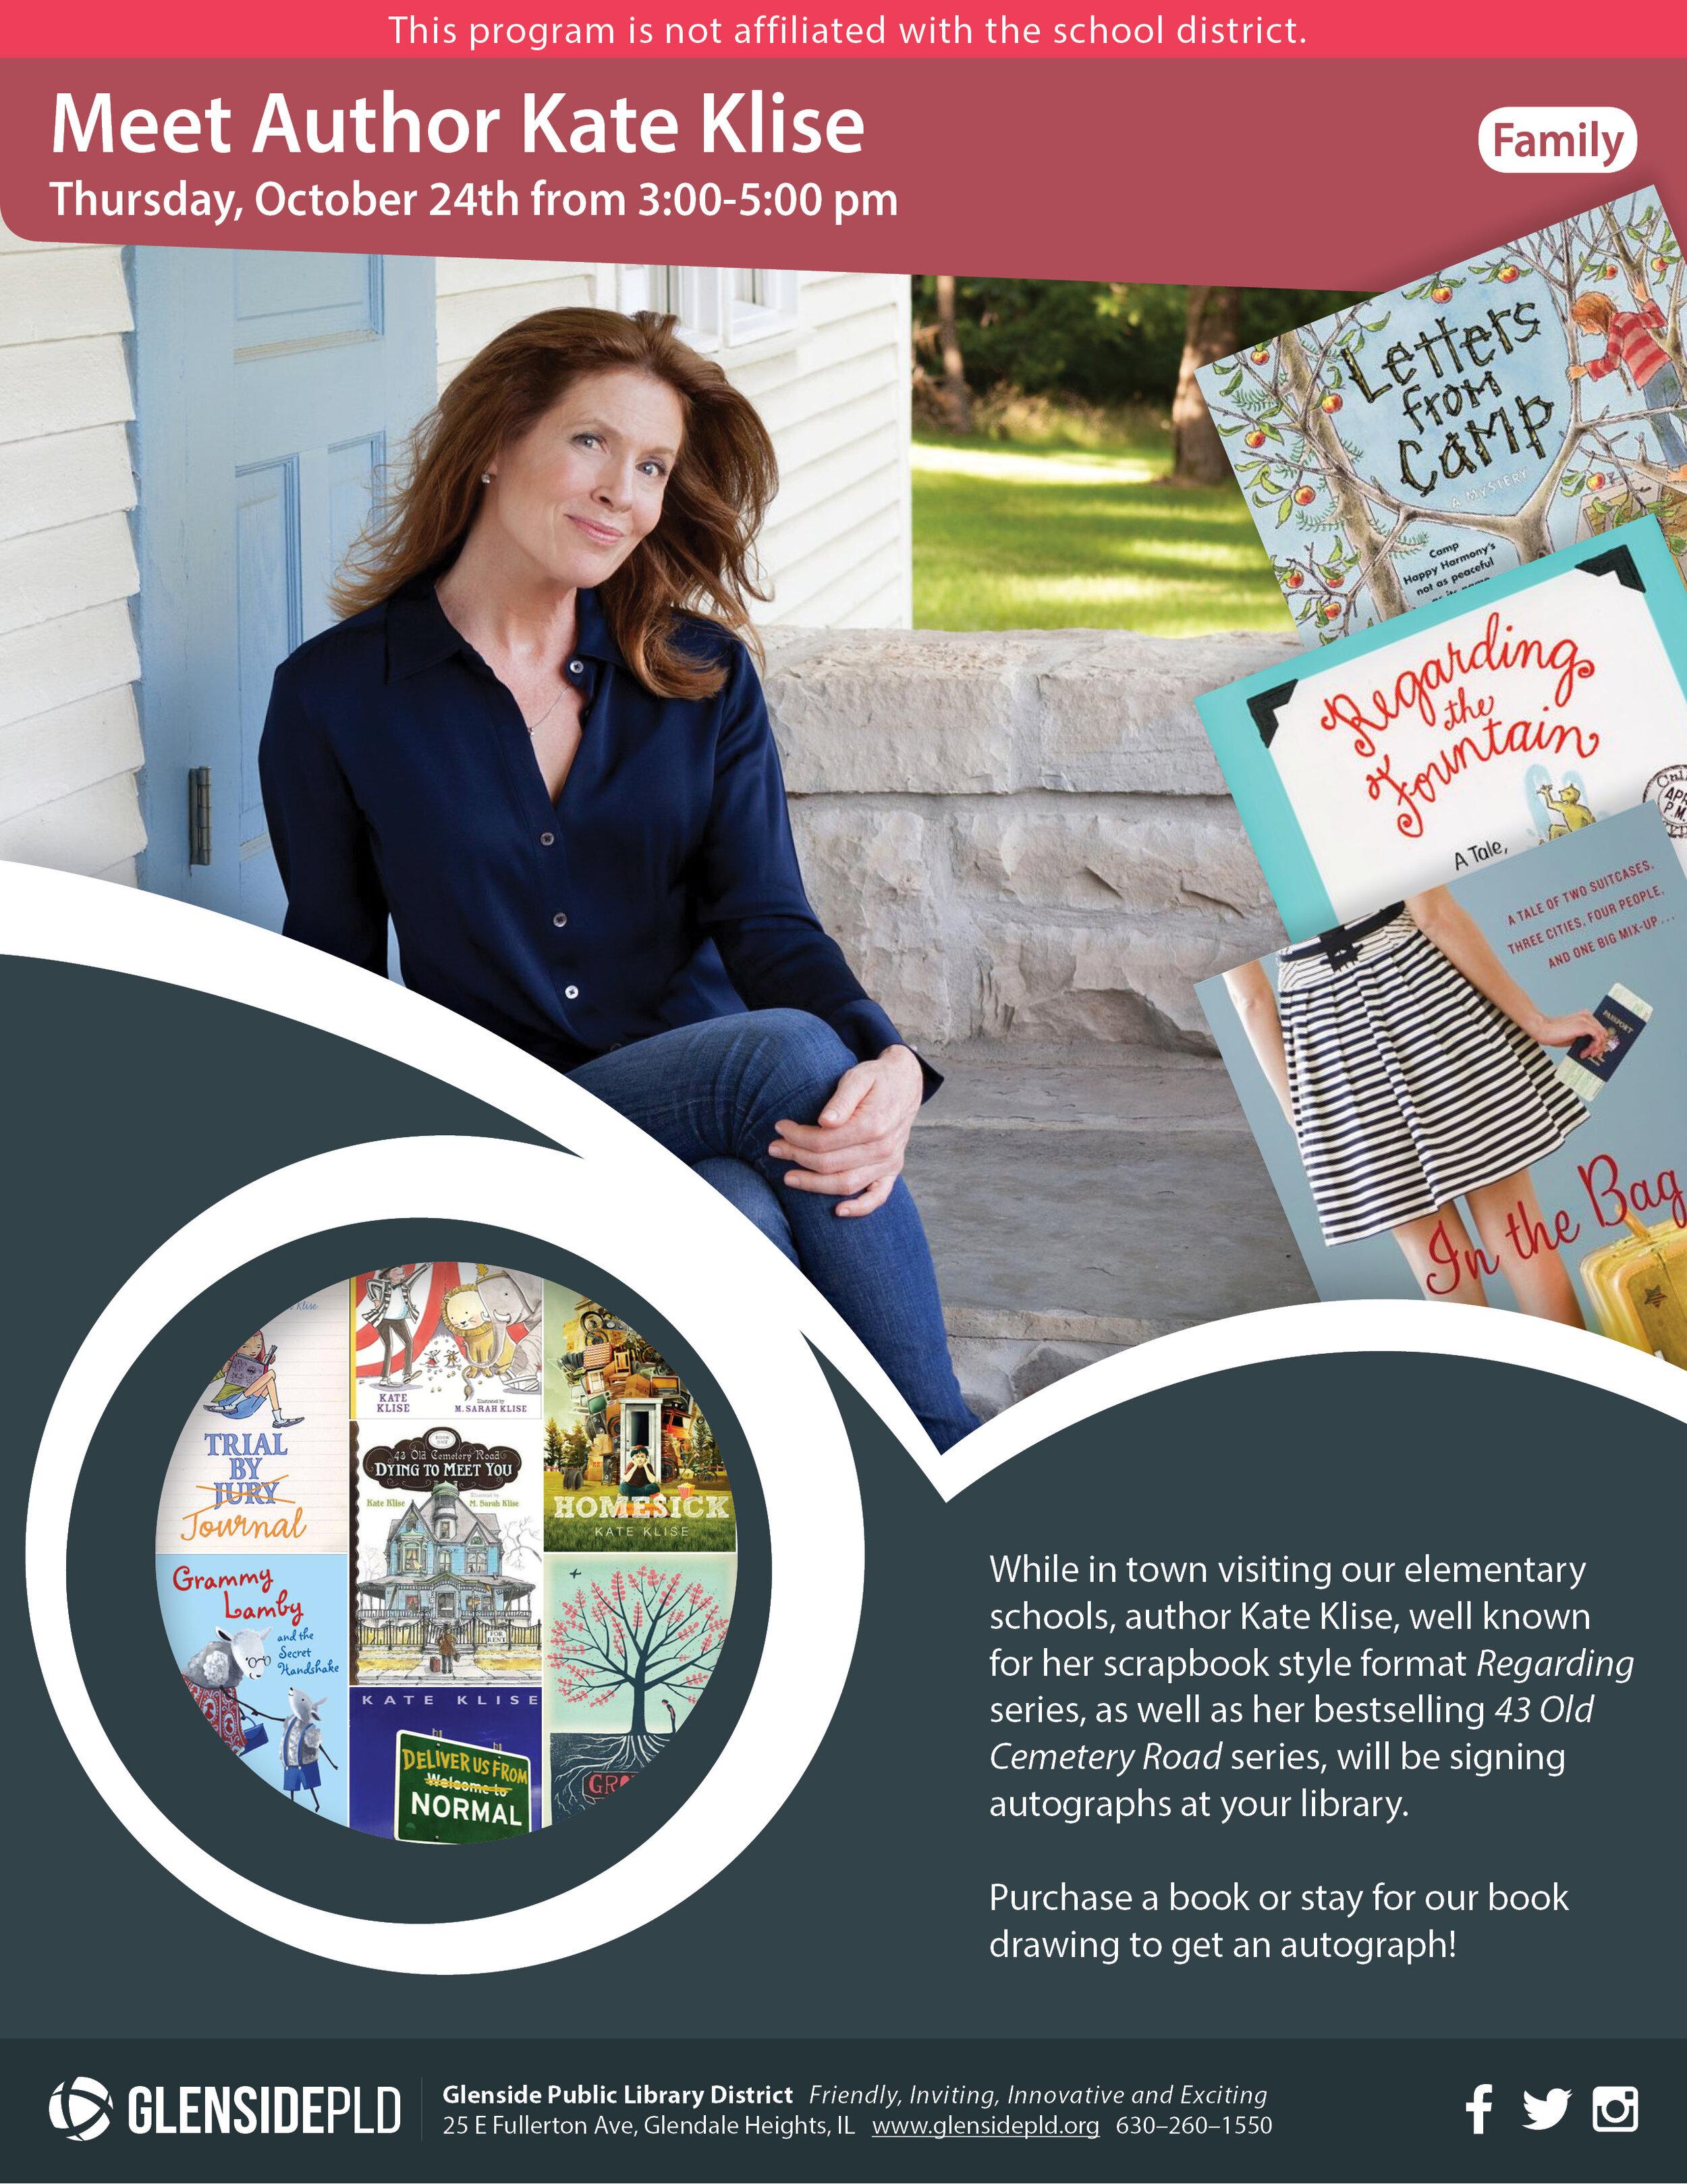 2019-10-24 Meet Author Kate Klise - School Disclaimer.jpg